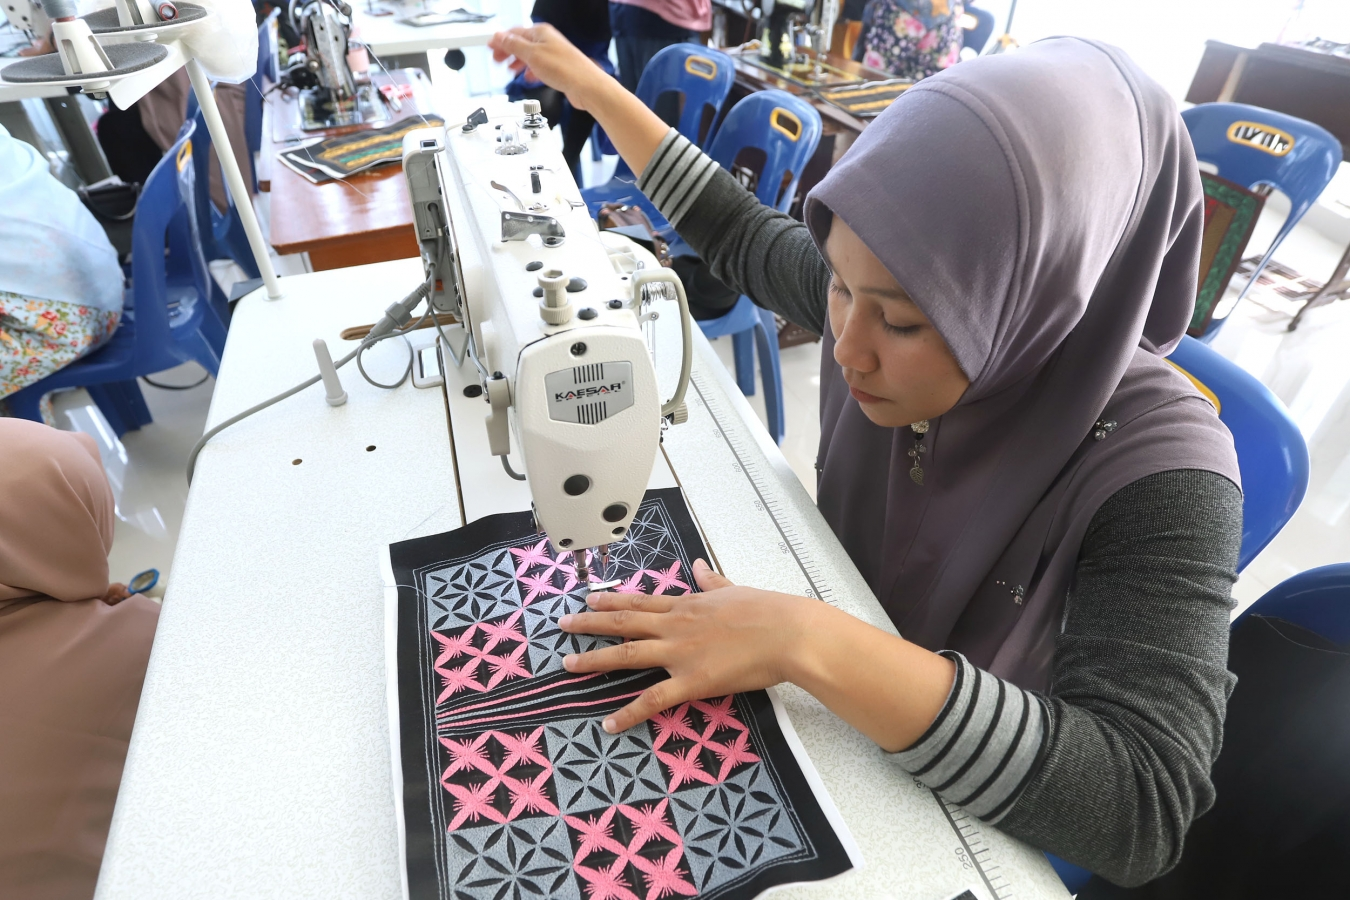 Dekranasda Banda Aceh Adakan Pelatihan Bordir Tas Motif Aceh dan Finishing Tas Motif Aceh